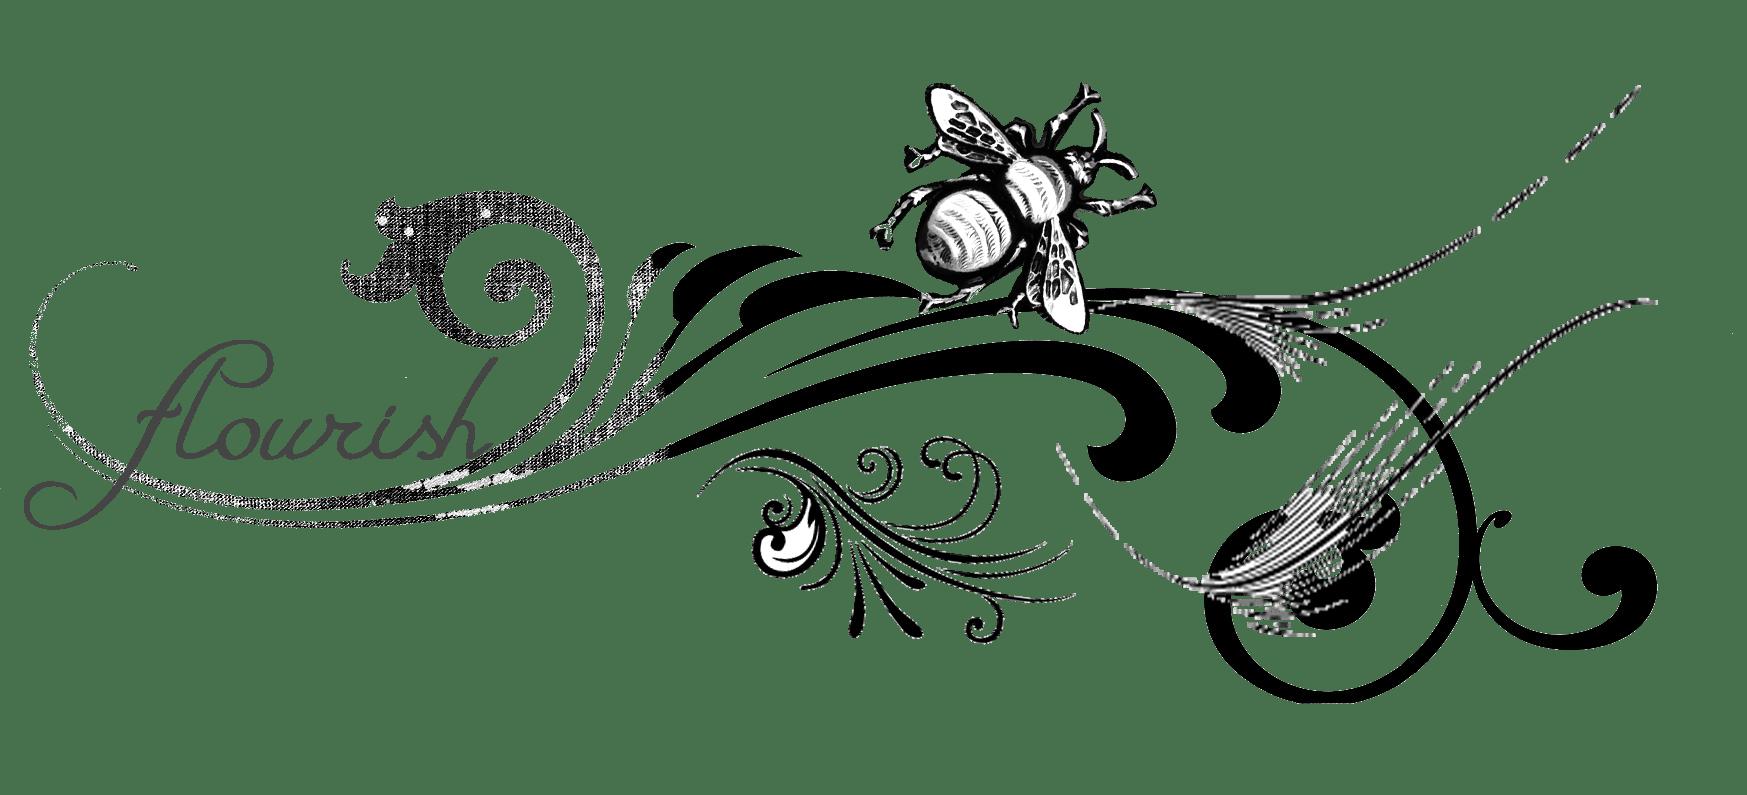 Flow Fests Flourish in 2017!